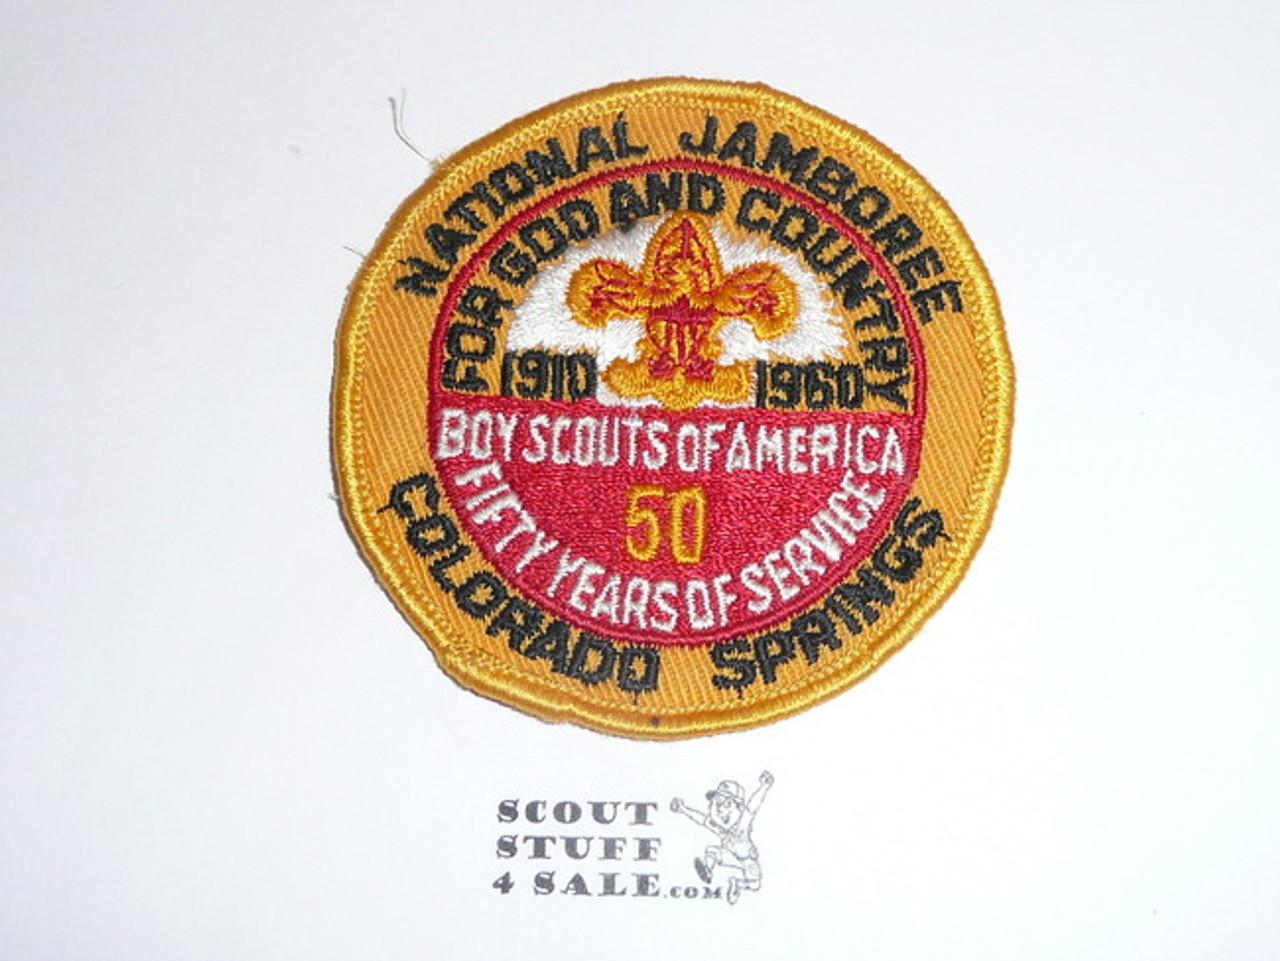 1960 National Jamboree Patch, Lt. Use